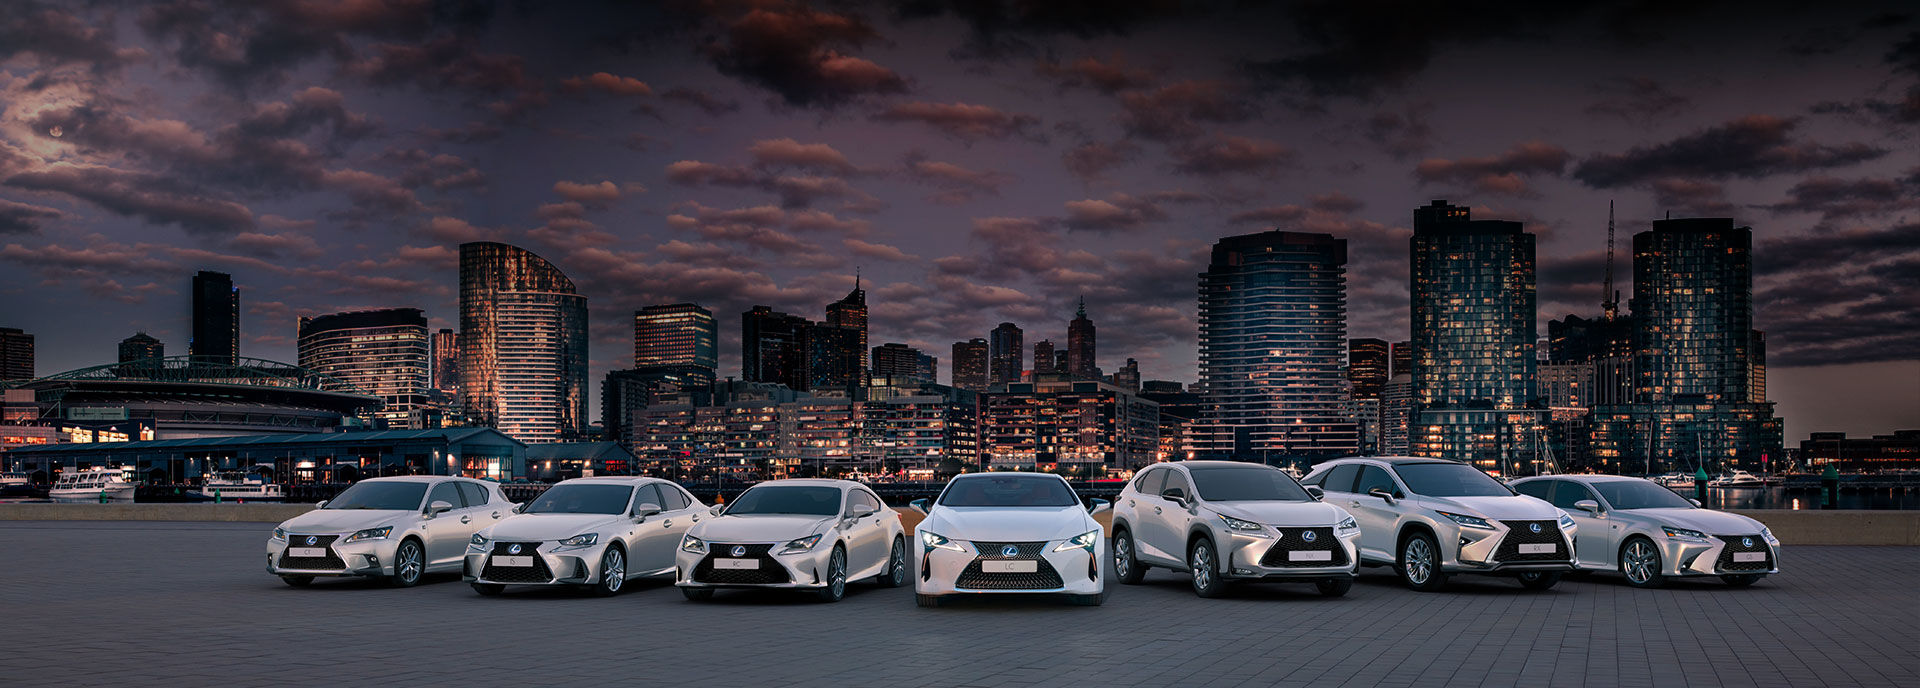 Lexus hybrider i stadsmiljö